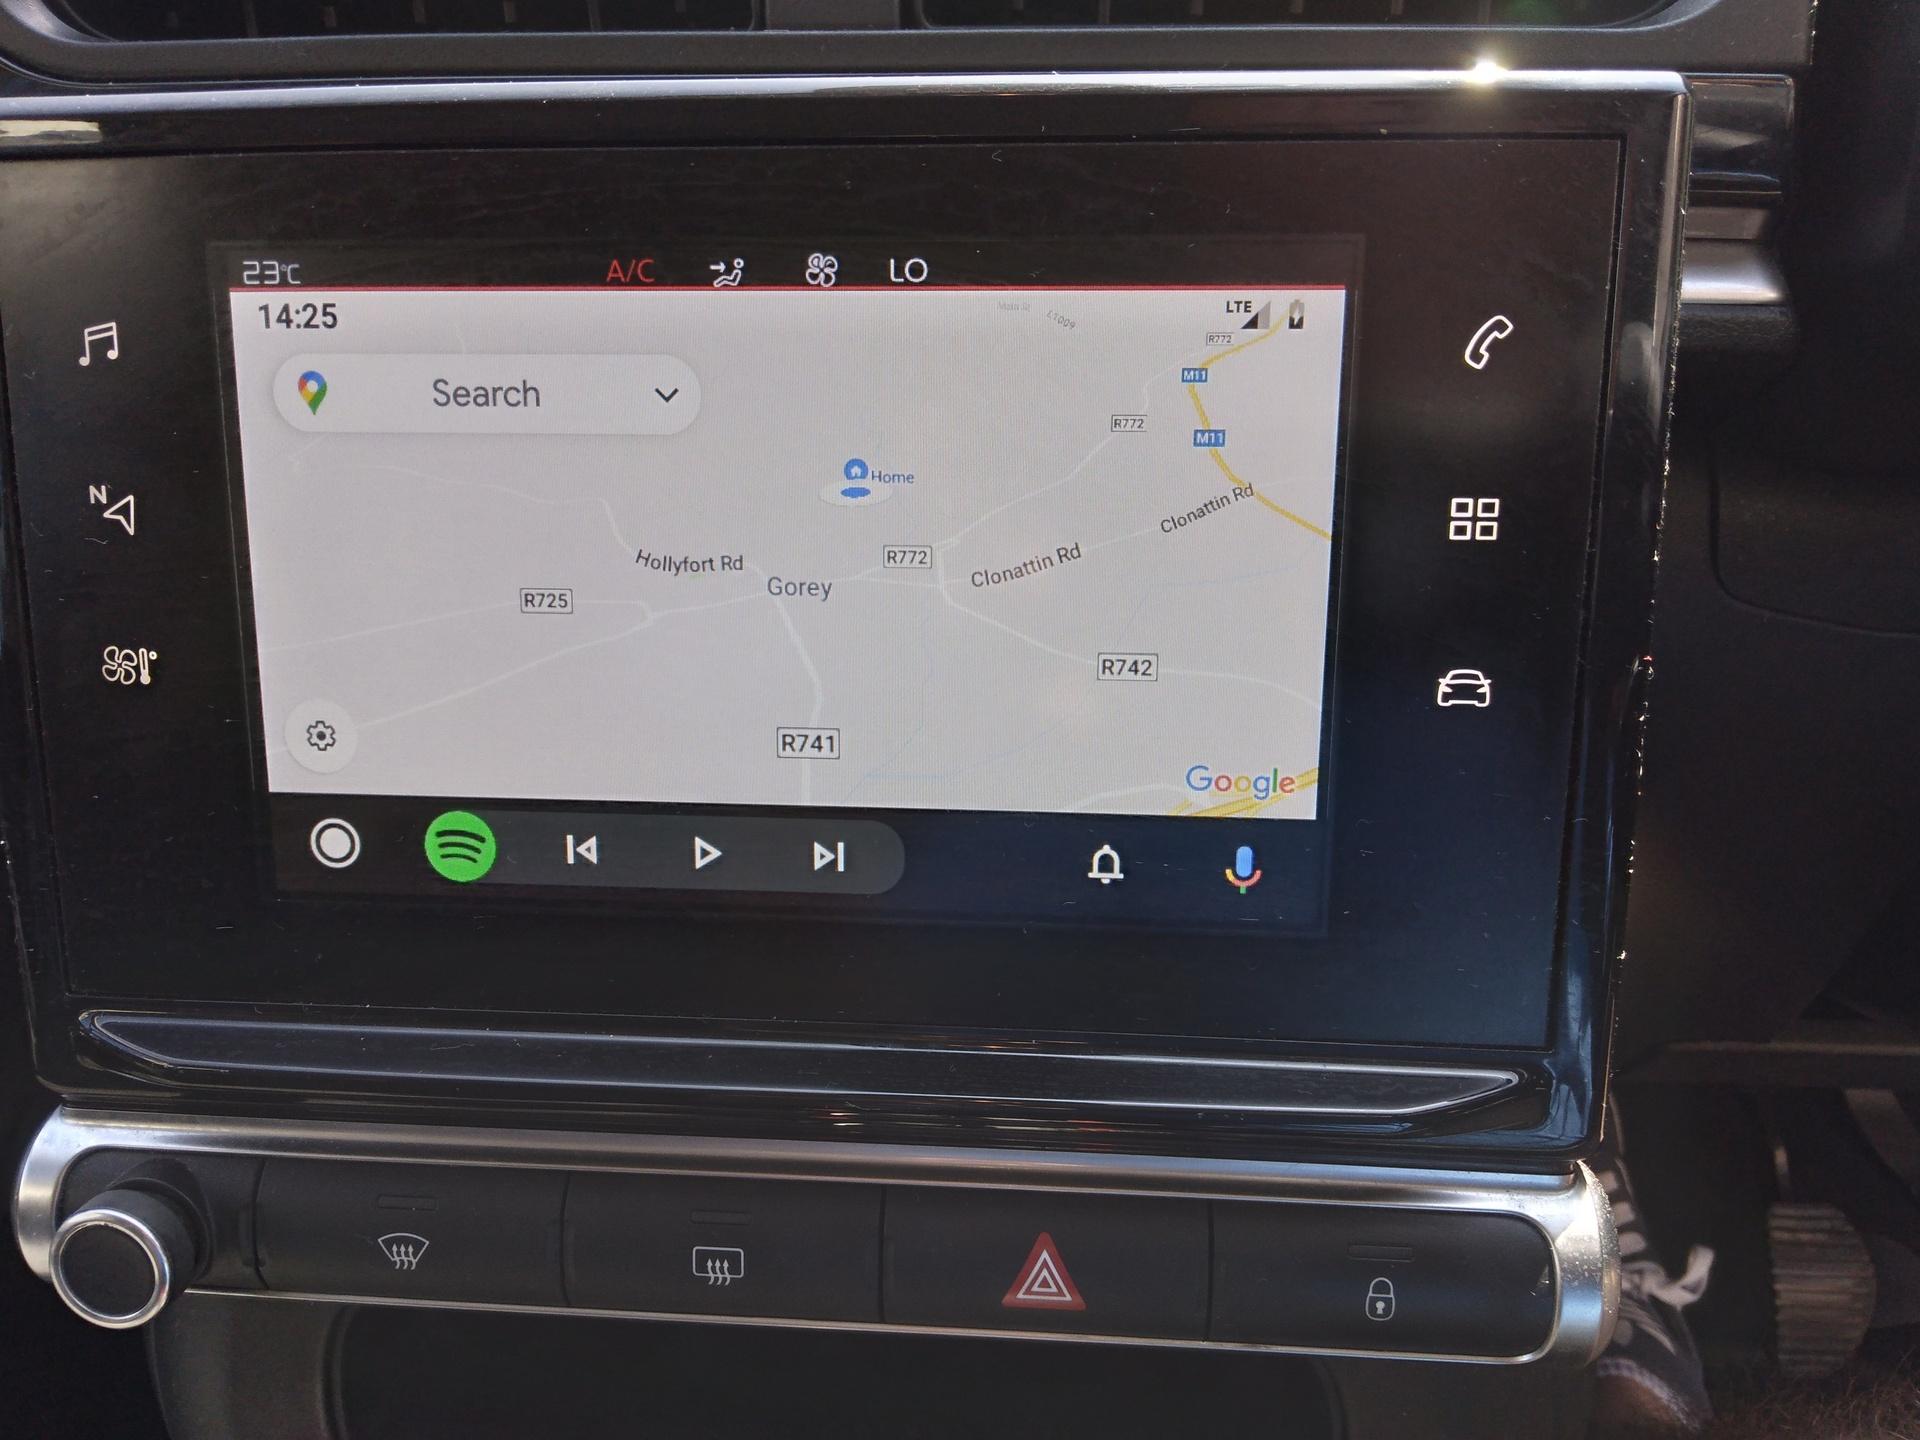 Used Citroen C3 2018 in Wexford